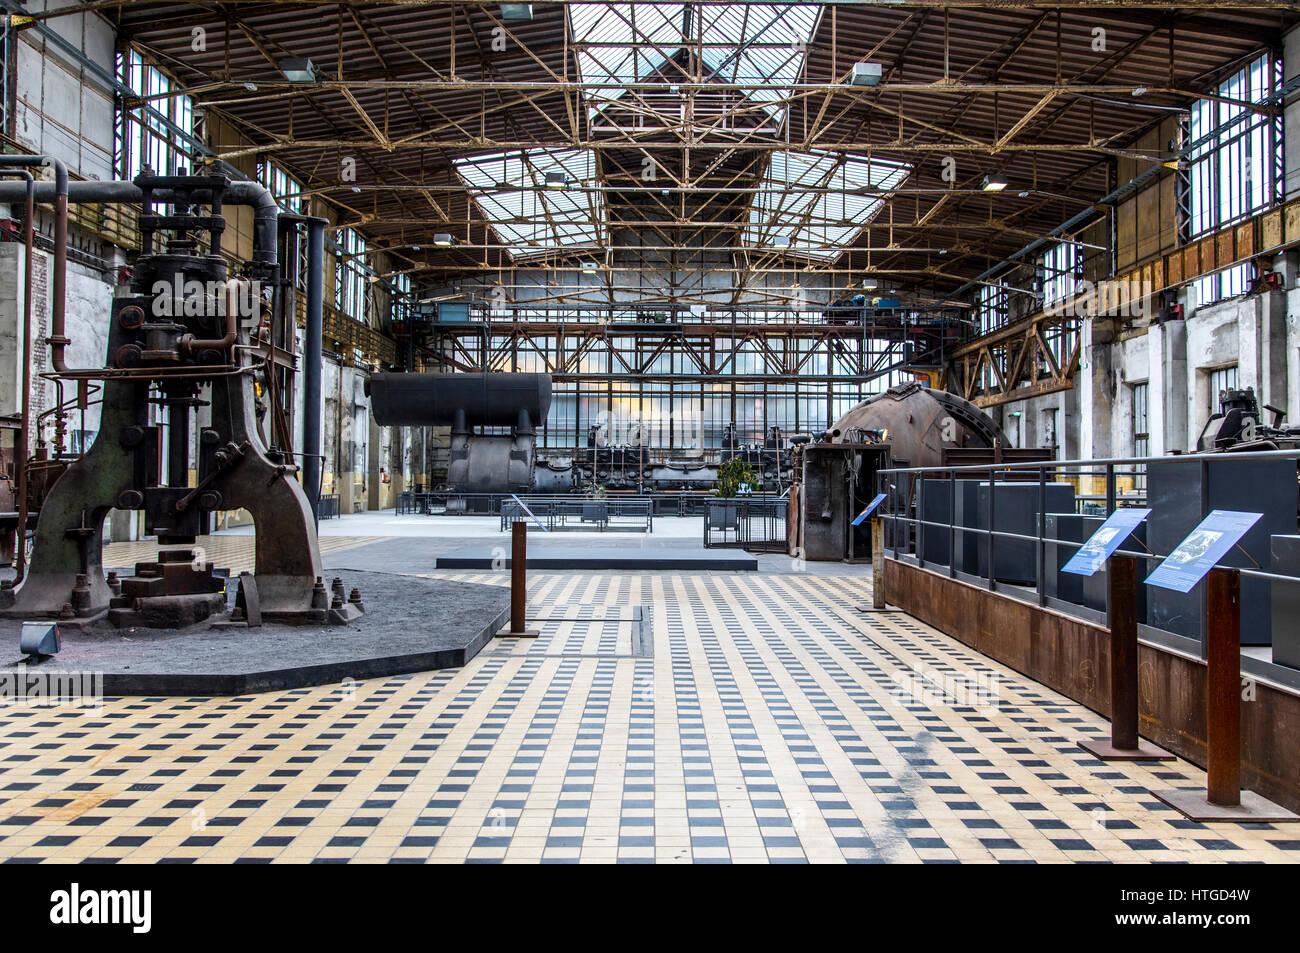 Henrichshütte, former steelworks, industrial museum, Hattingen, Germany, gas turbines, - Stock Image